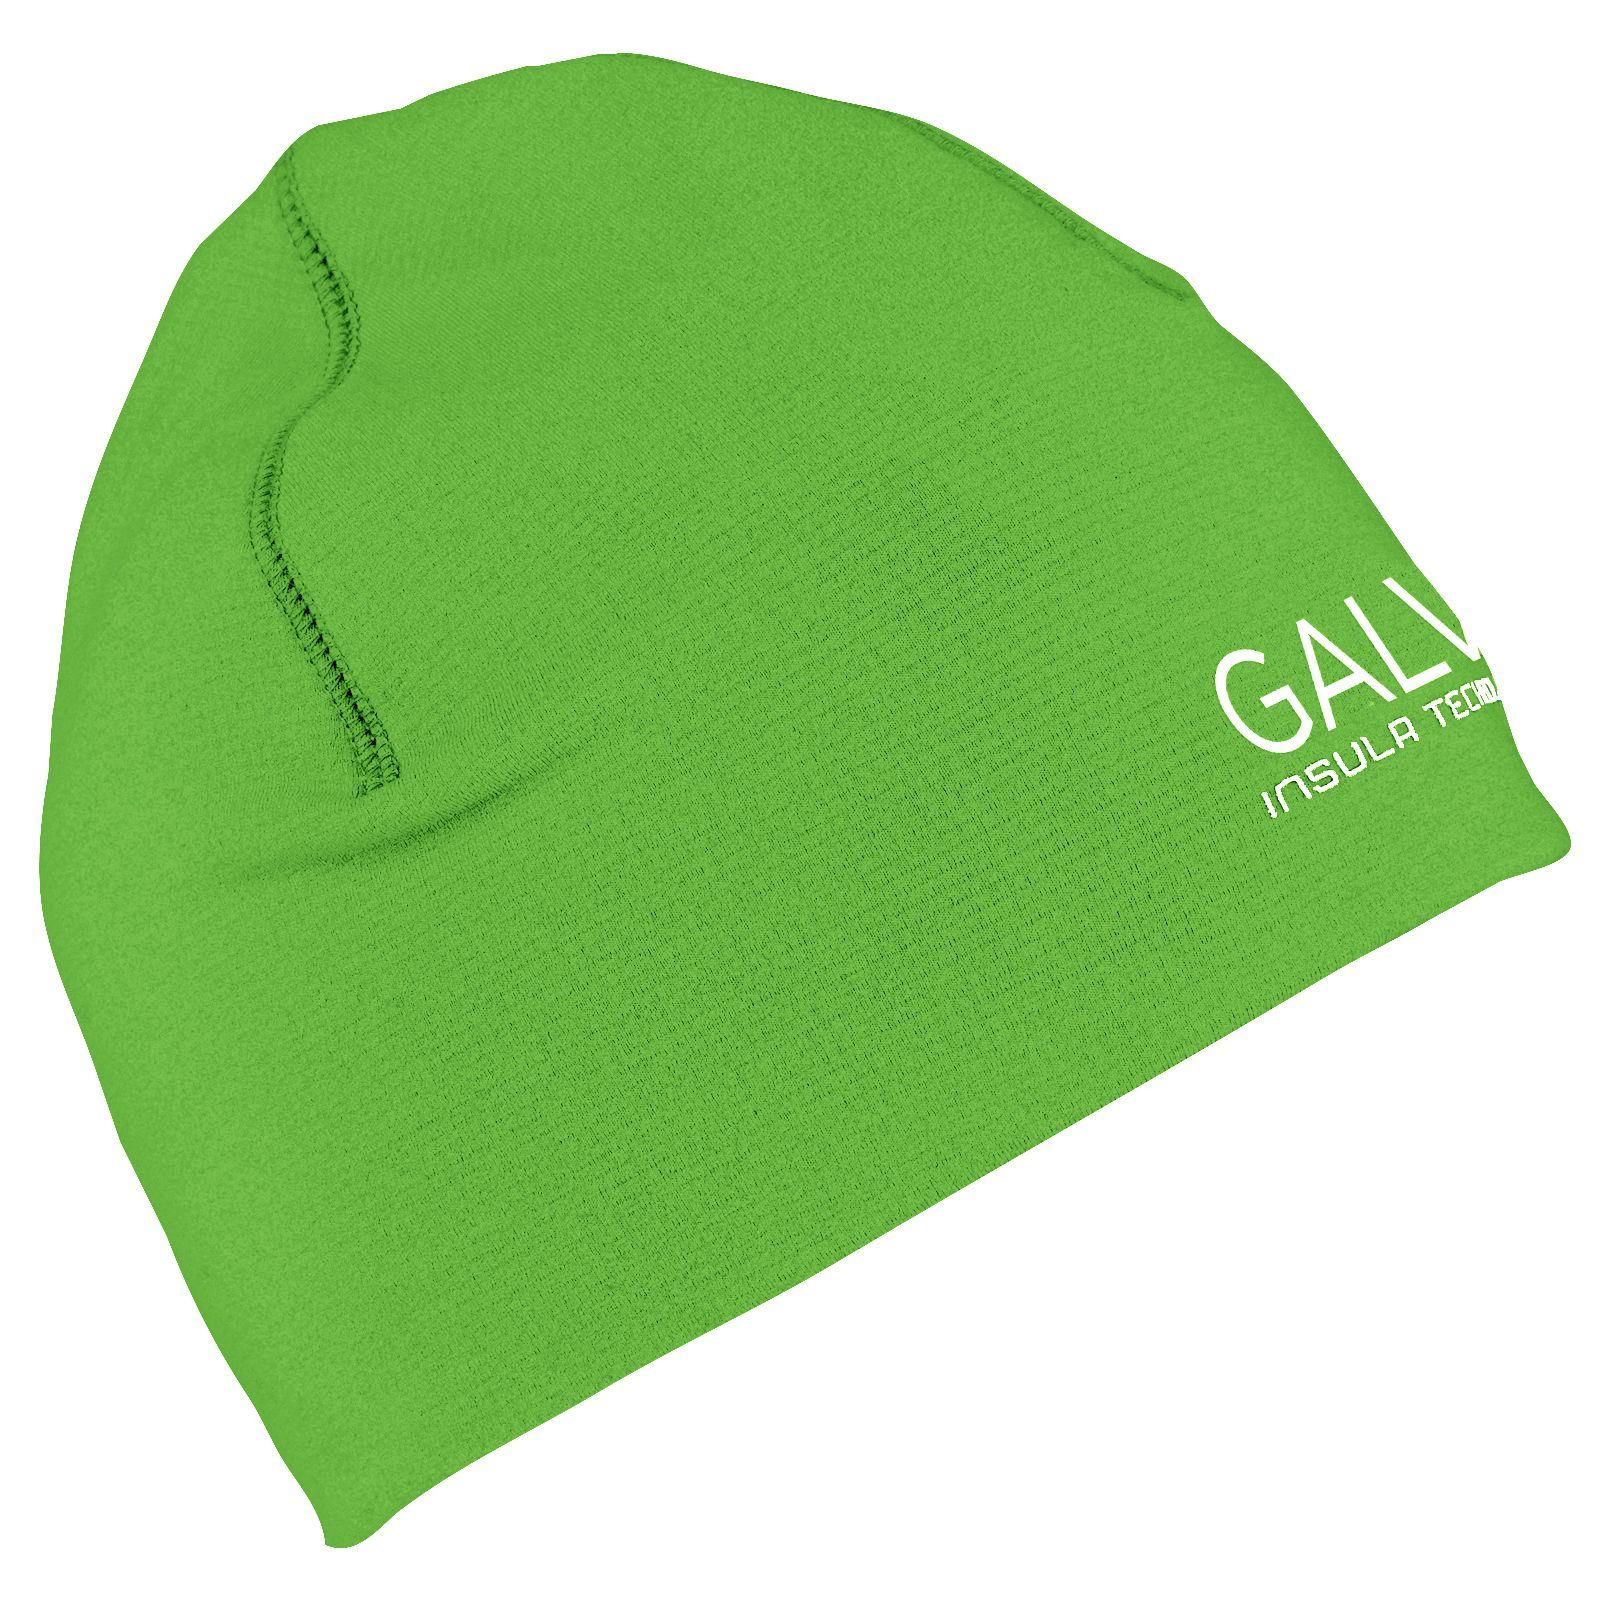 77710cfbacd Galvin Green Duran Insula Beanie Hat Fore Green